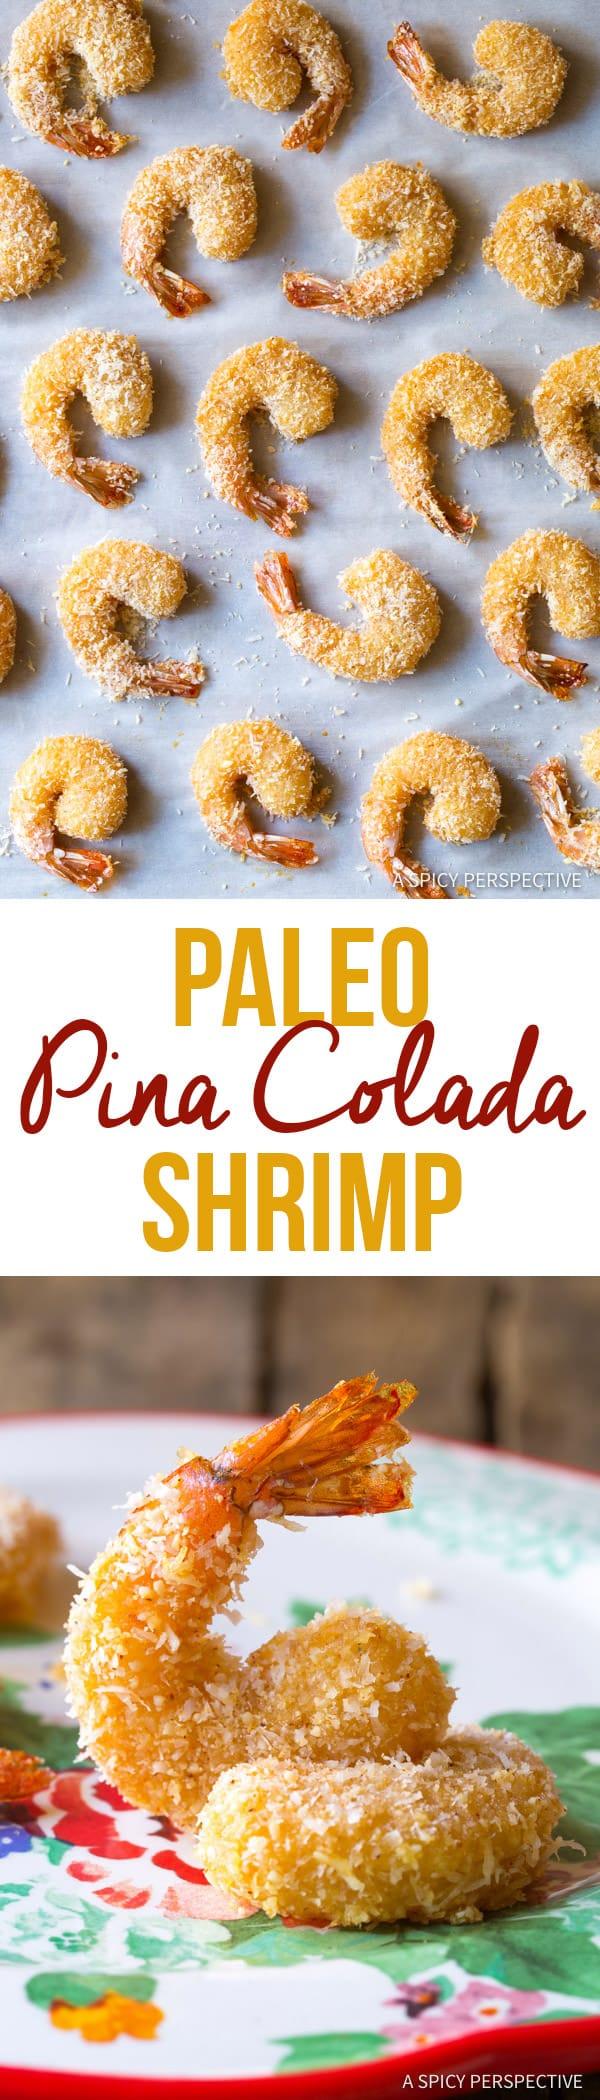 Healthy Paleo Coconut Shrimp Recipe (Pina Colada Shrimp & Gluten Free!)   ASpicyPerspective.com